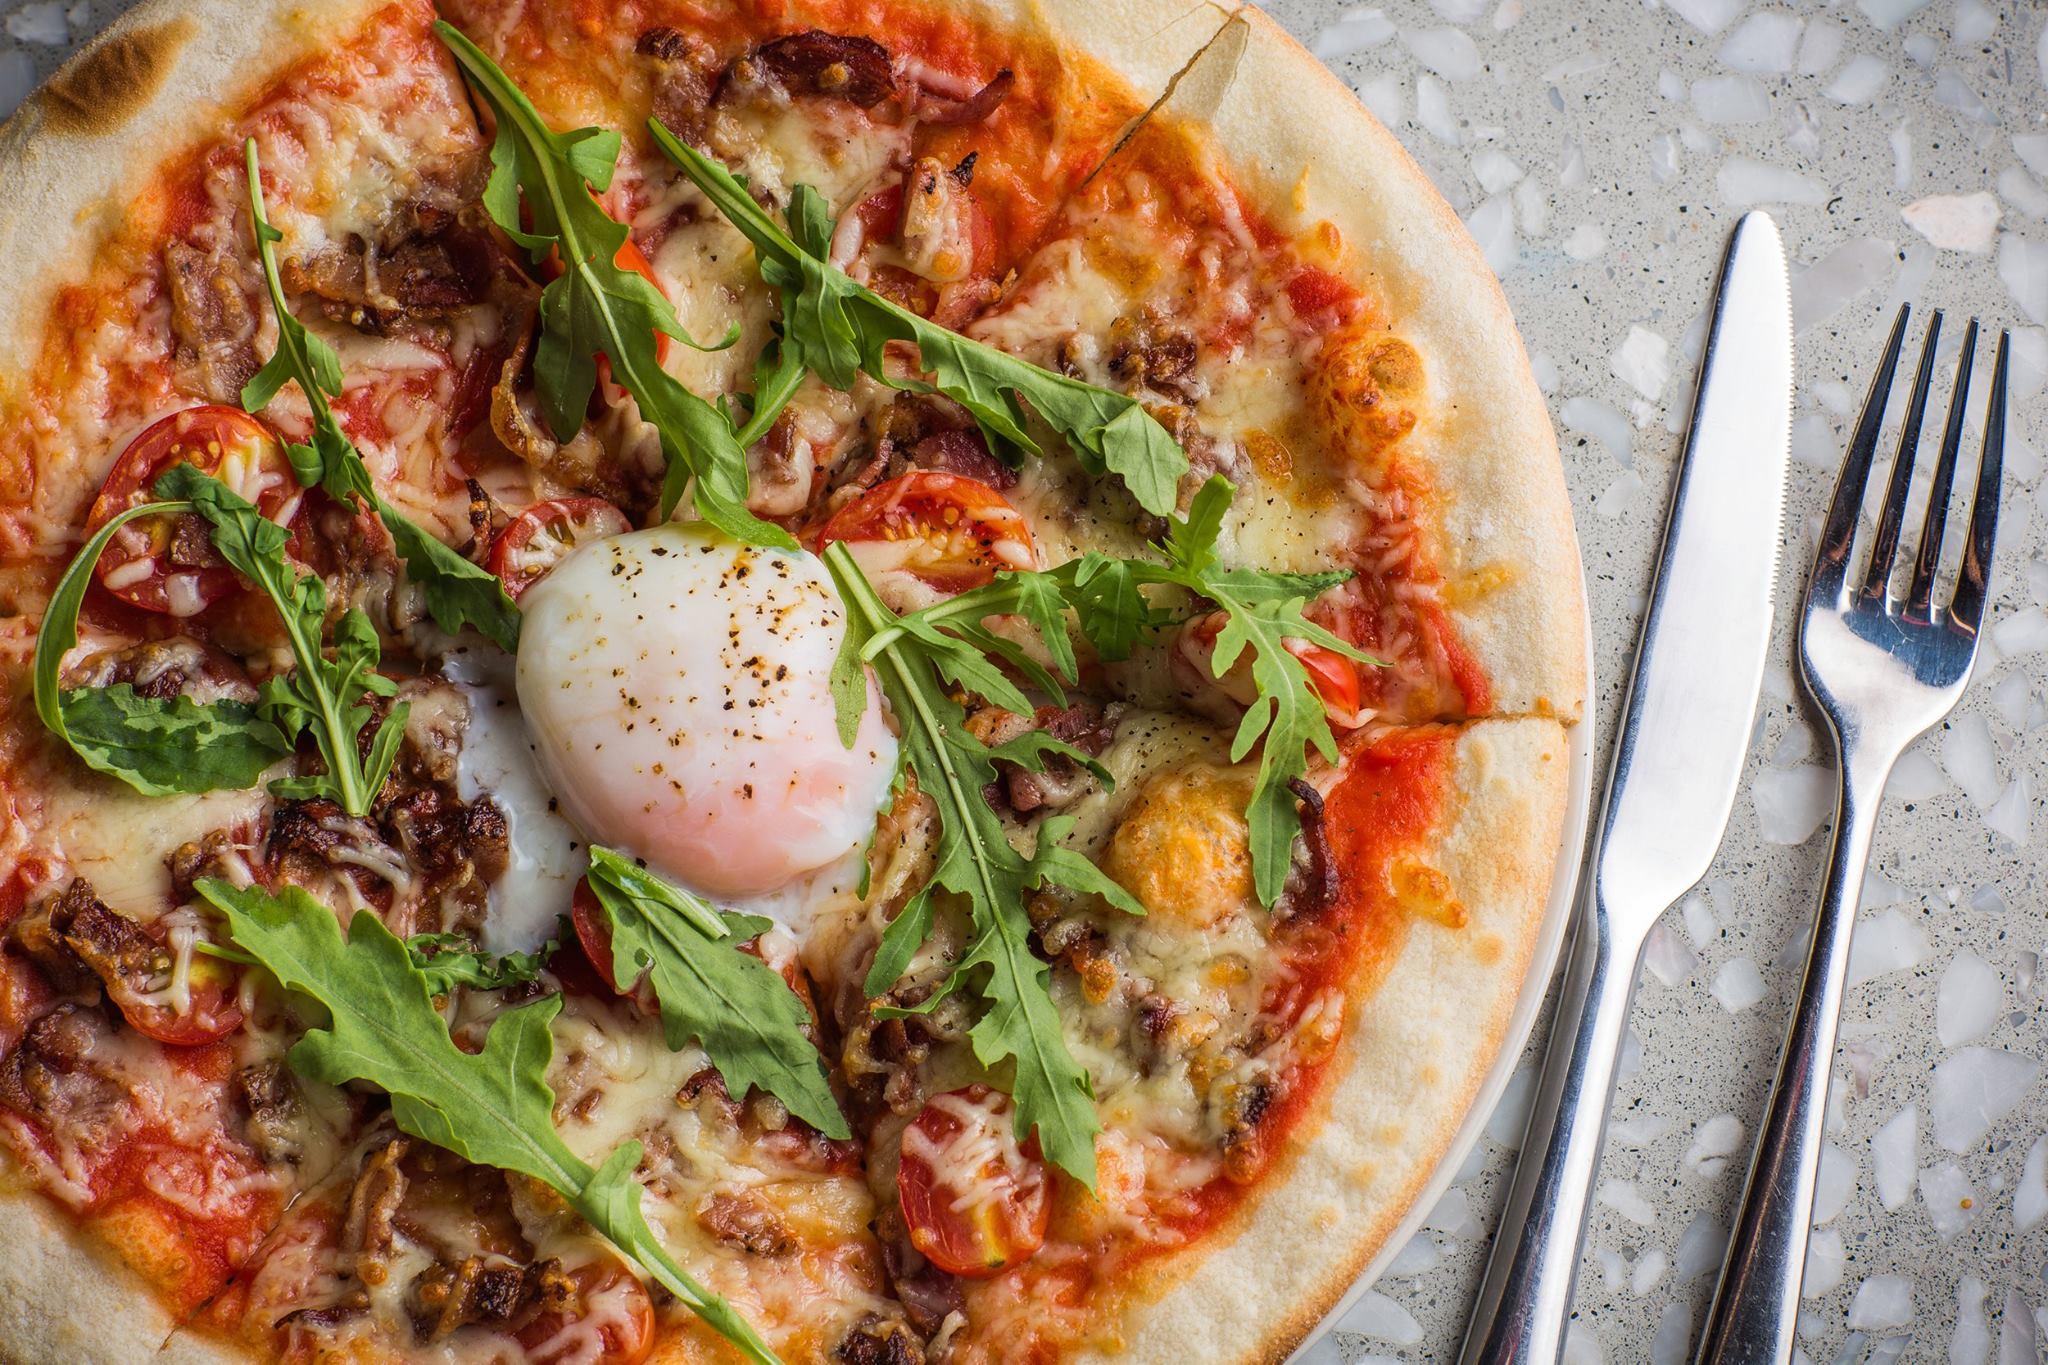 Little-Creatures-Egg-Pizza-Brunch